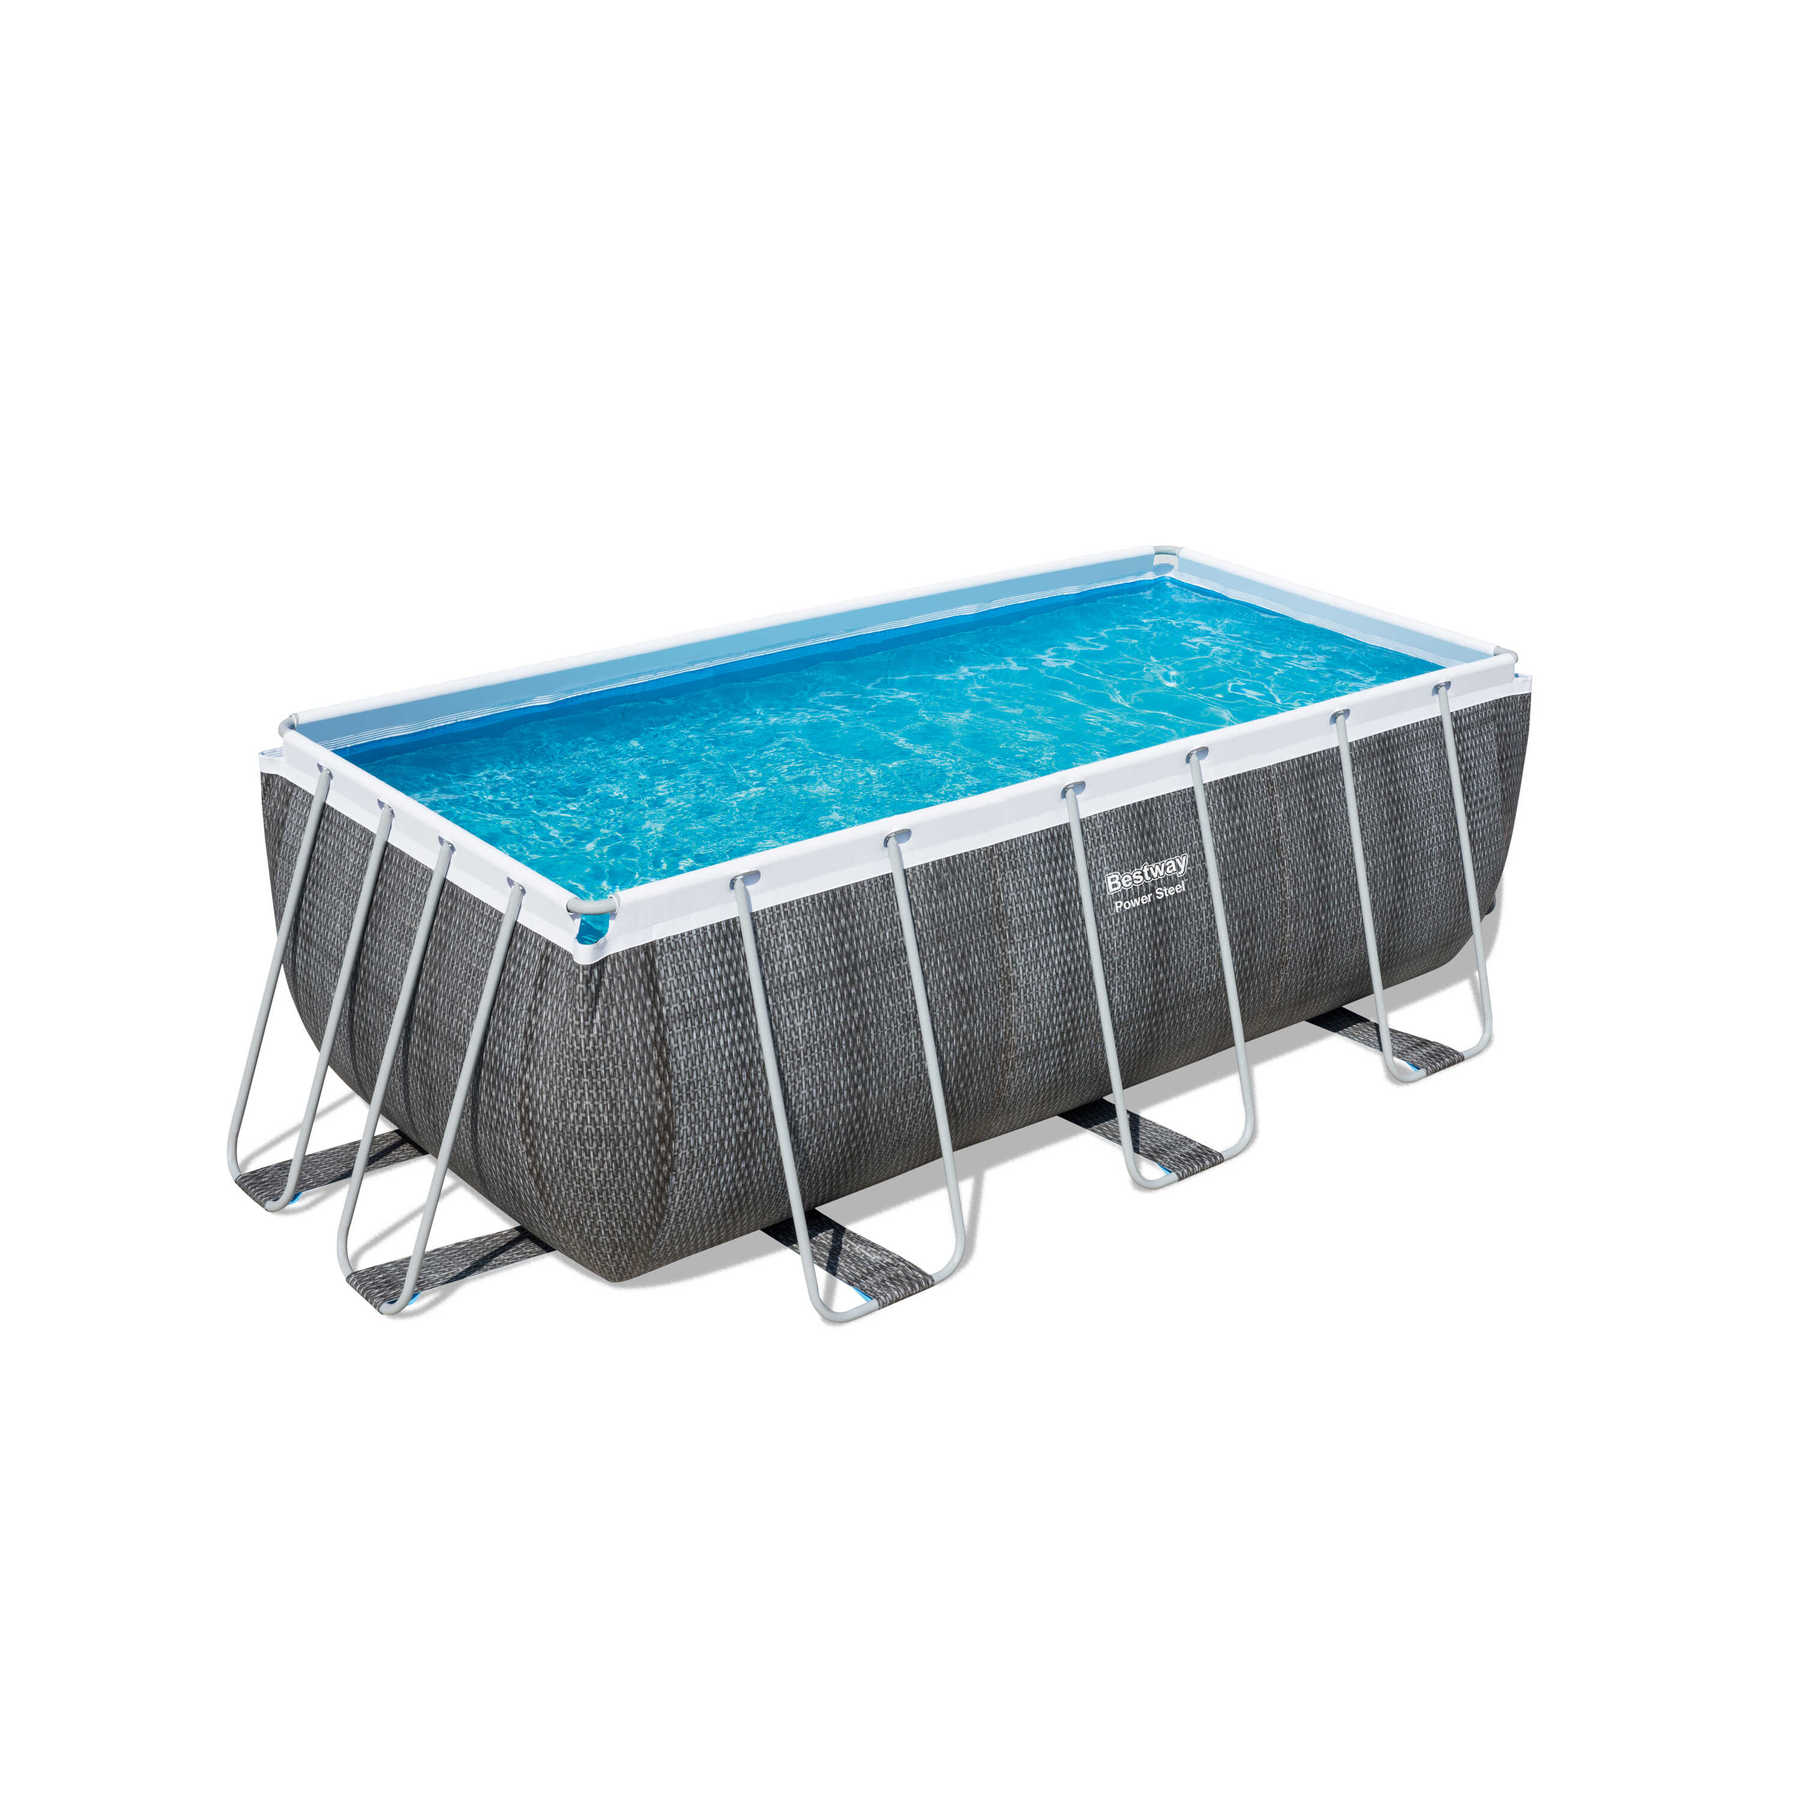 Scaffold Rectangular Pool 412 х201х122см, Filter Pump, Ladder, Dispenser, Outdoor Summer Swimming, Bestway, Item No. 56722